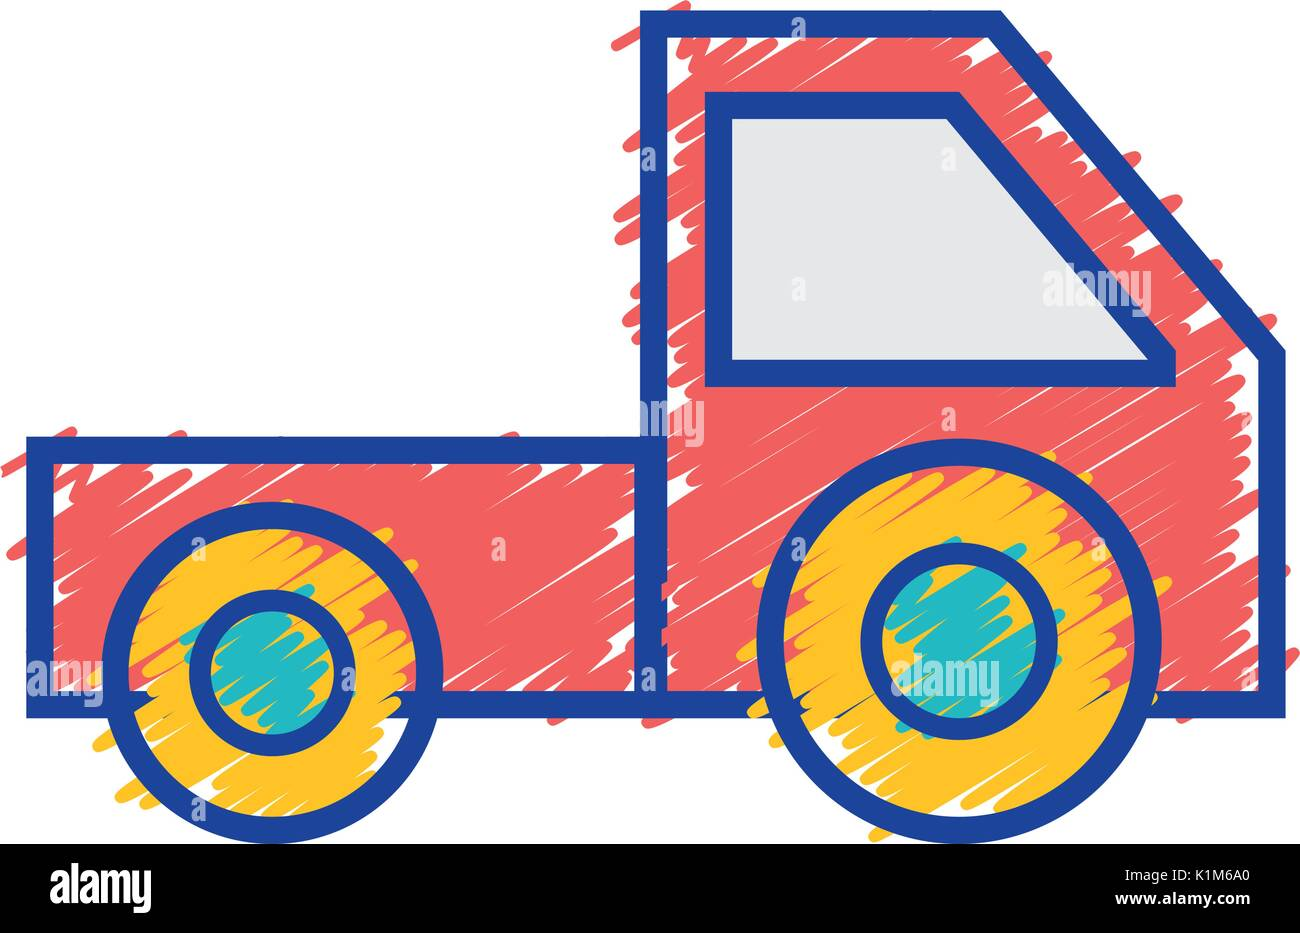 trunk vehicle transportation style design - Stock Vector